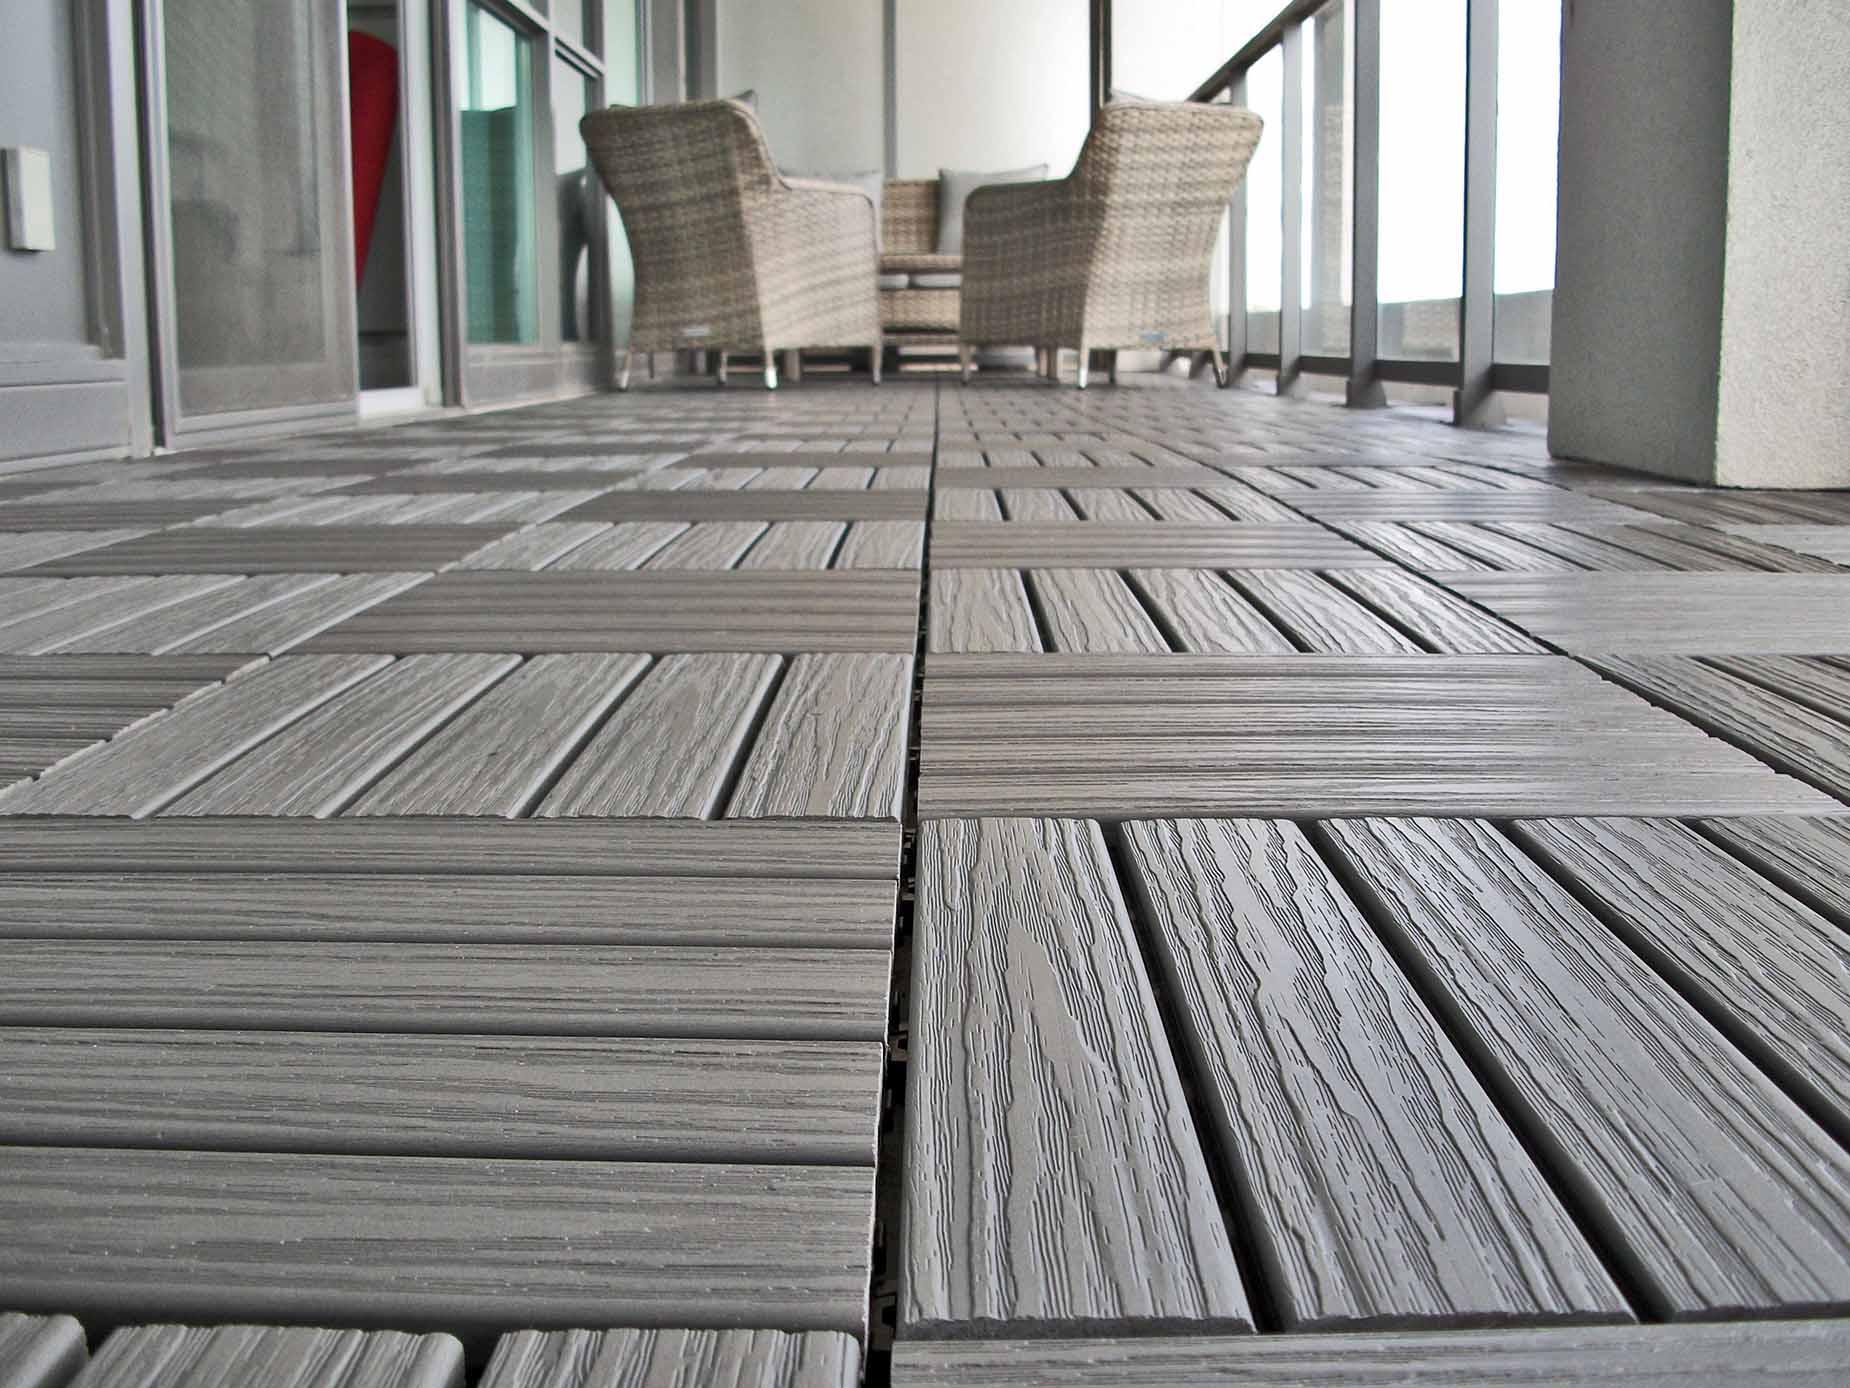 Balcony Flooring Rooftop Patios In Toronto Gta Industry Leading Design Build Team